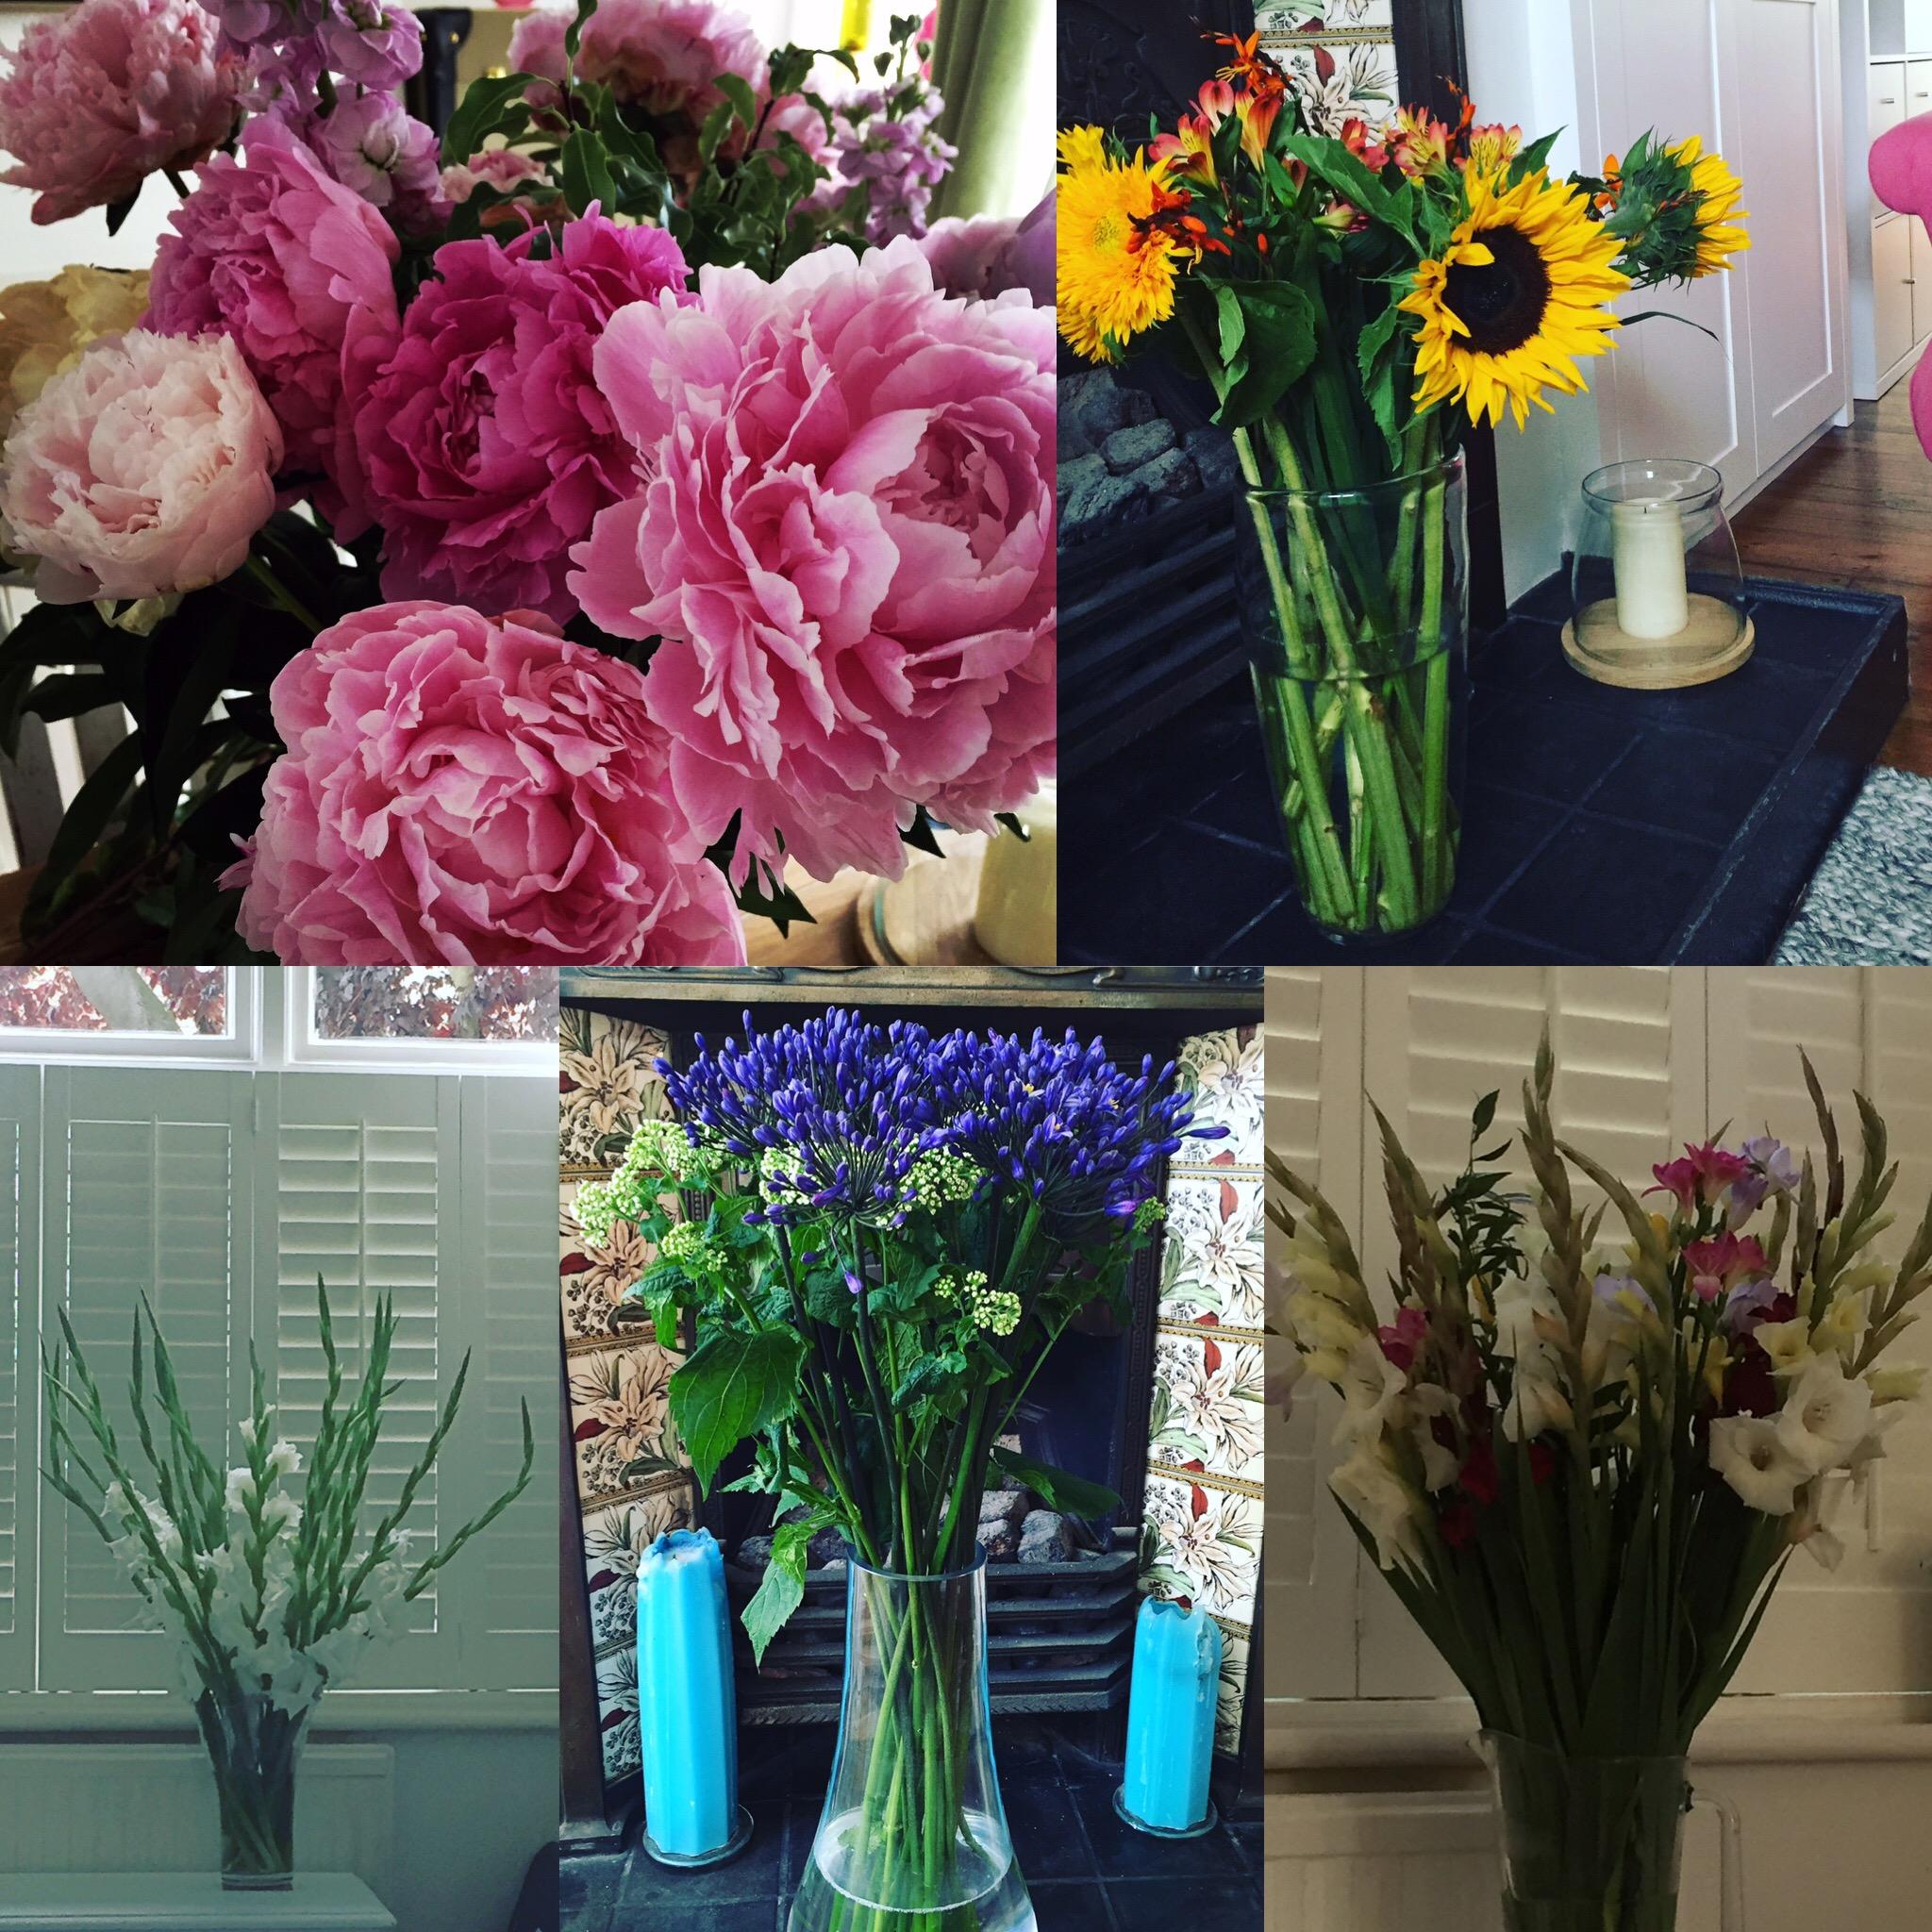 Lovely Freddie's Flowers in my home